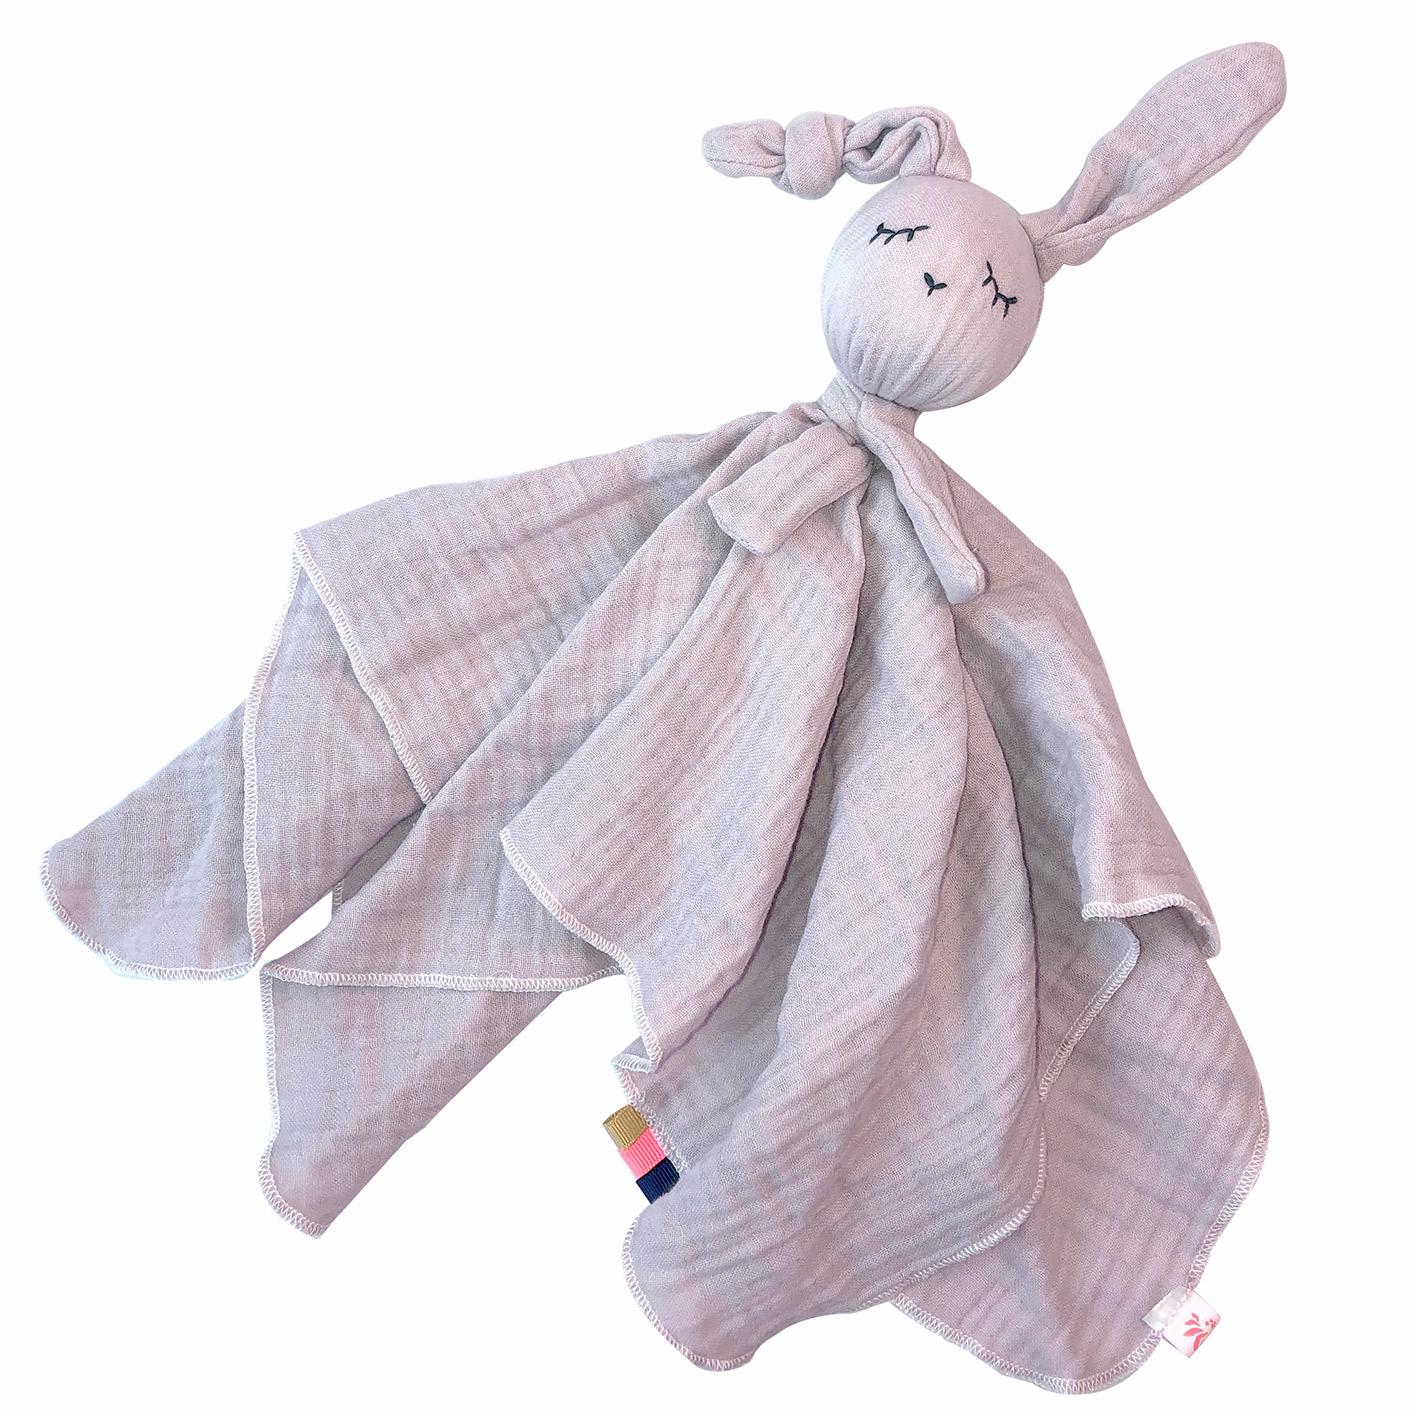 Towel Doll Rabbit Pale Rose